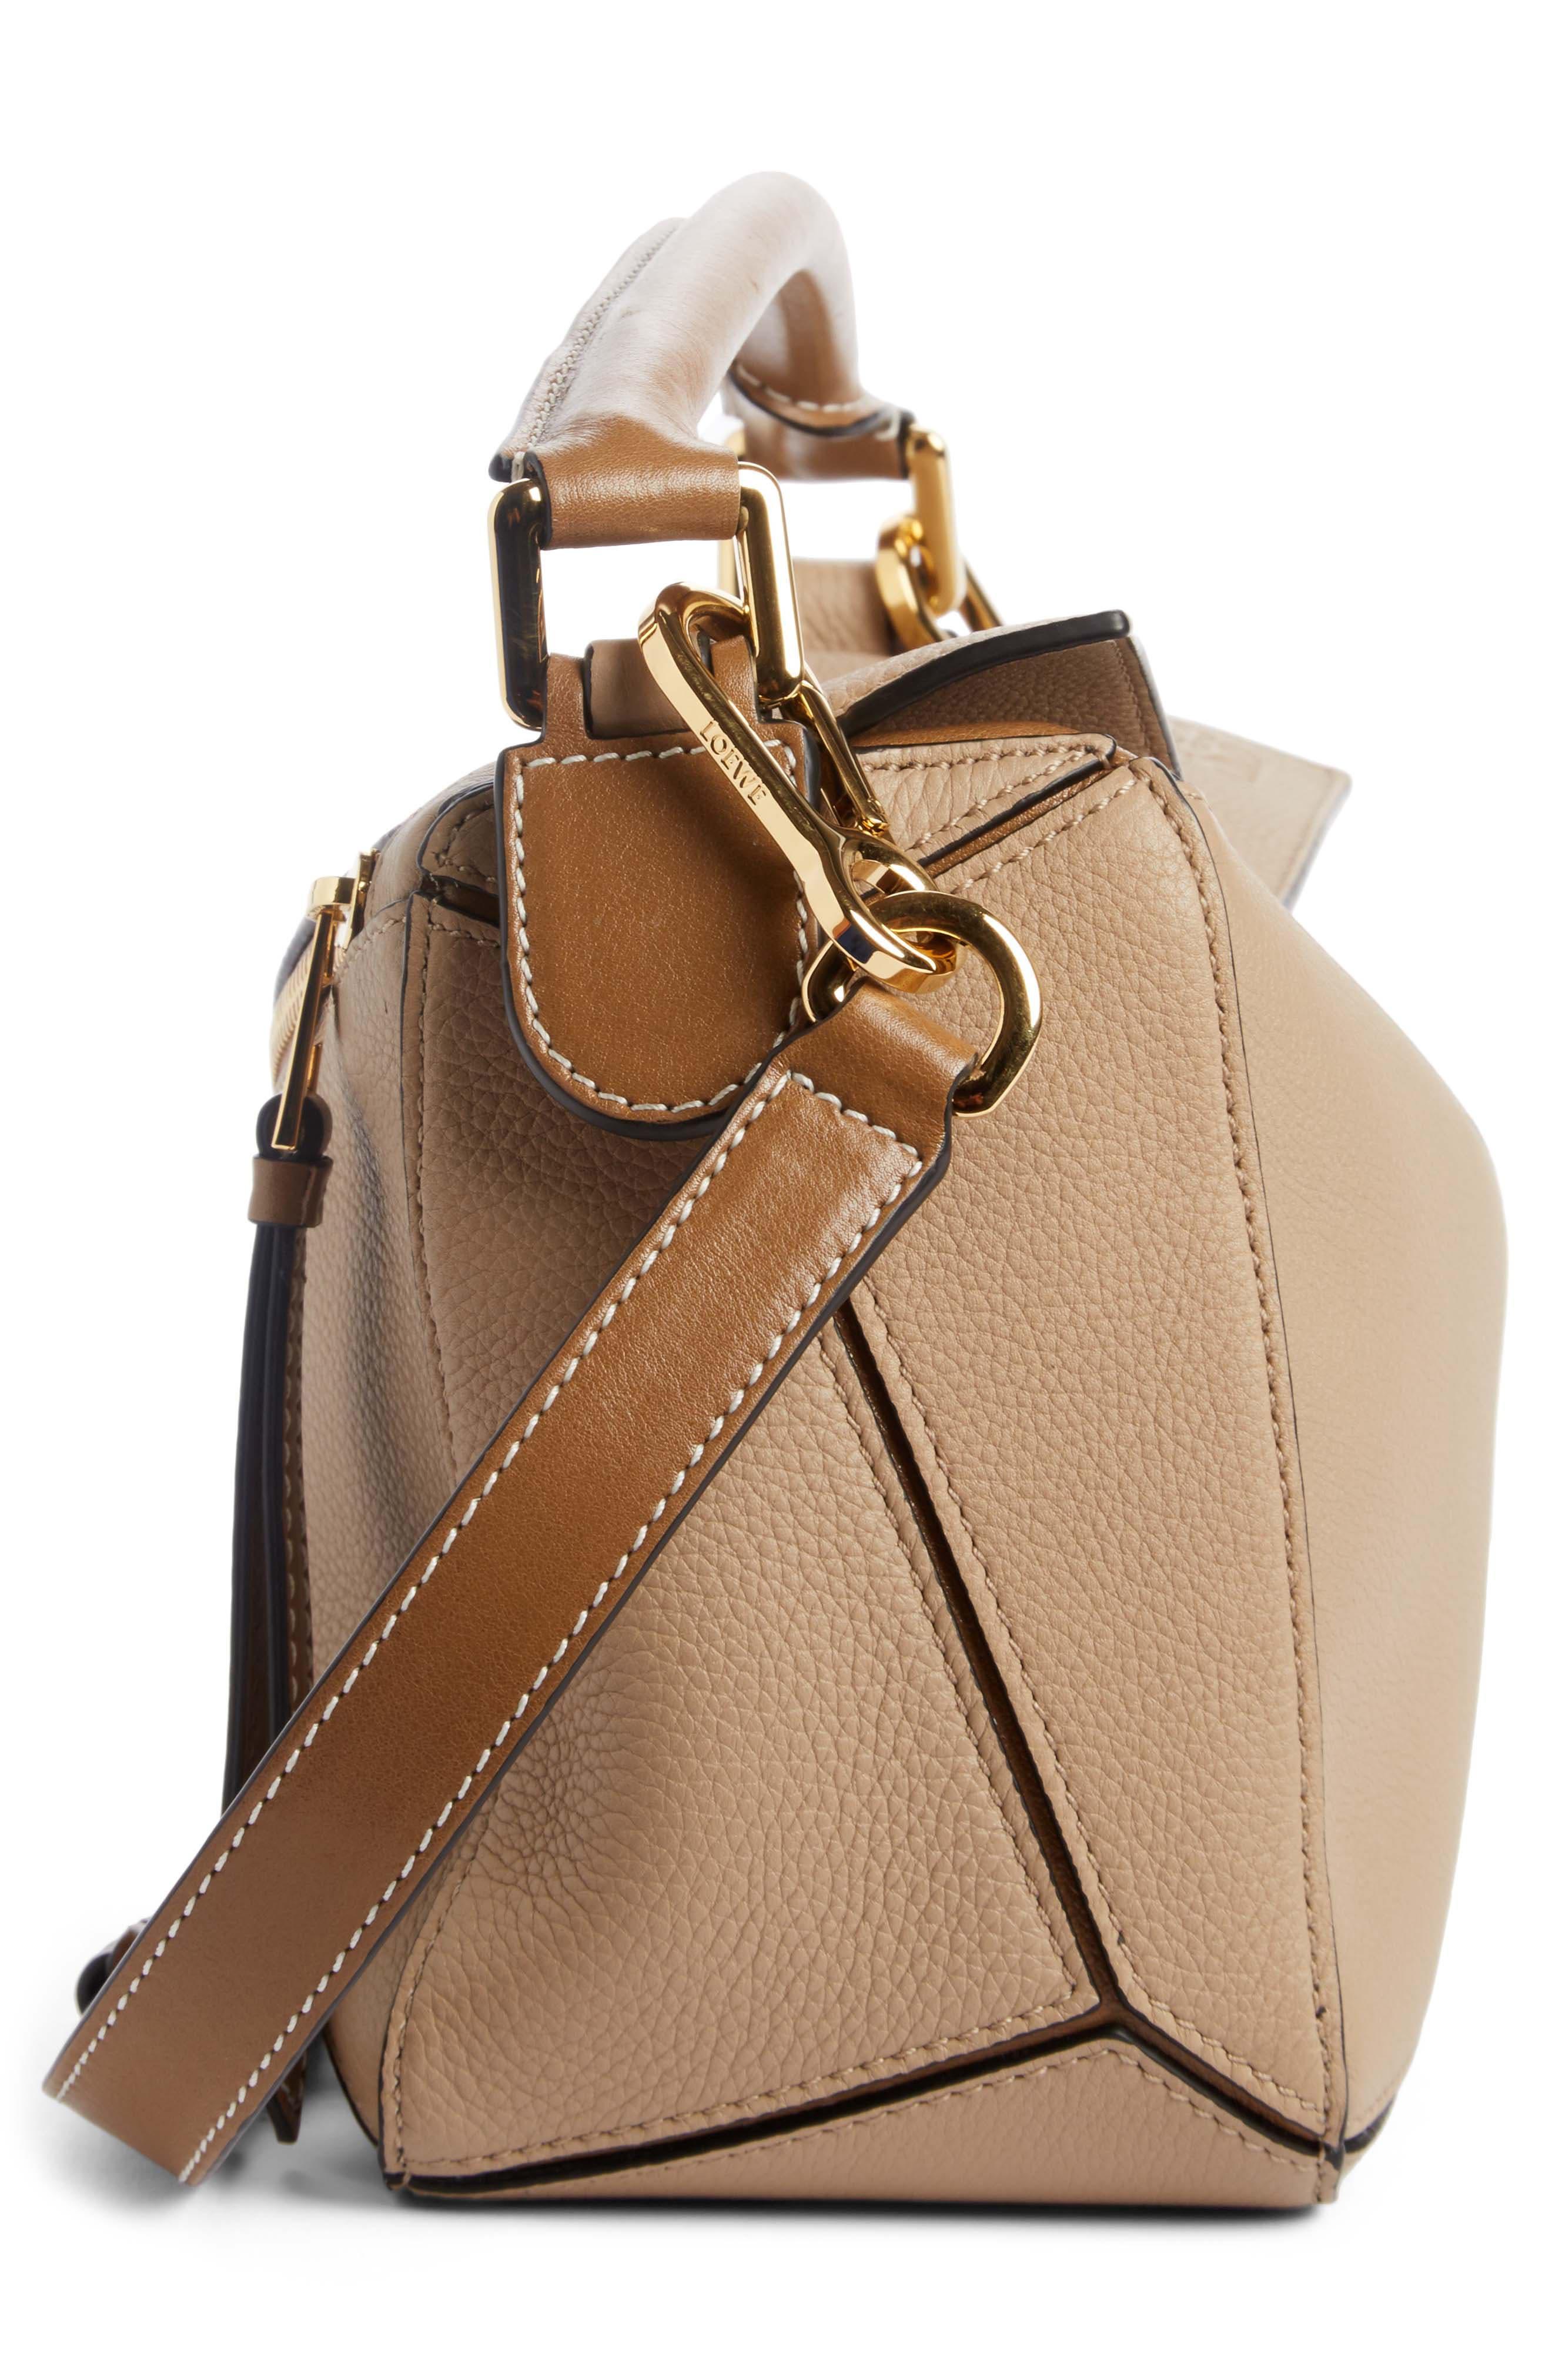 Medium Puzzle Calfskin Leather Shoulder Bag,                             Alternate thumbnail 3, color,                             200